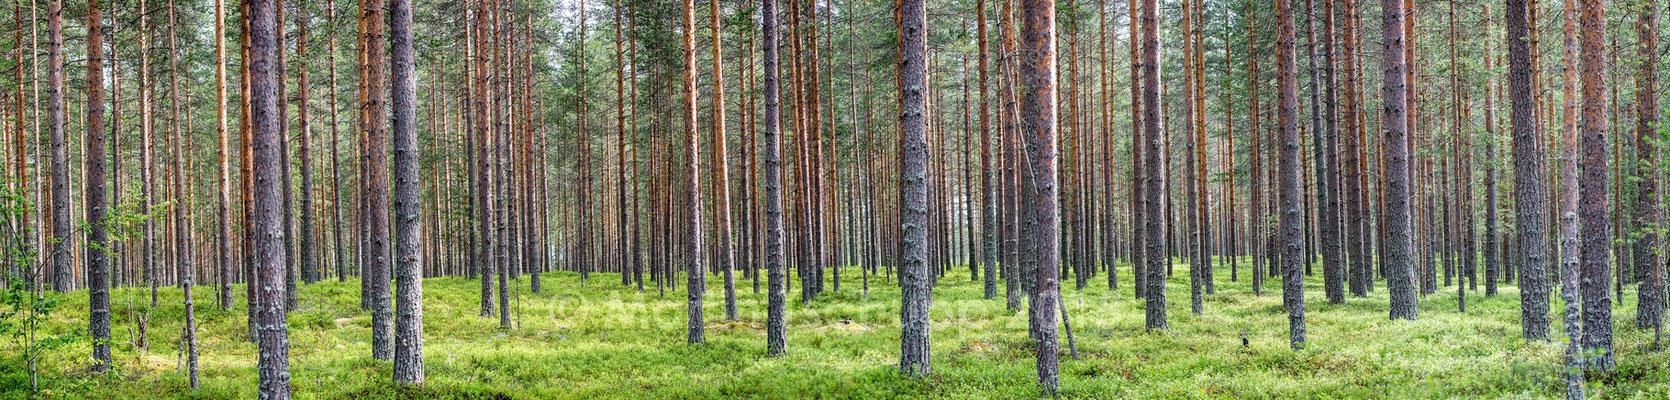 Kiefernwald Finnland